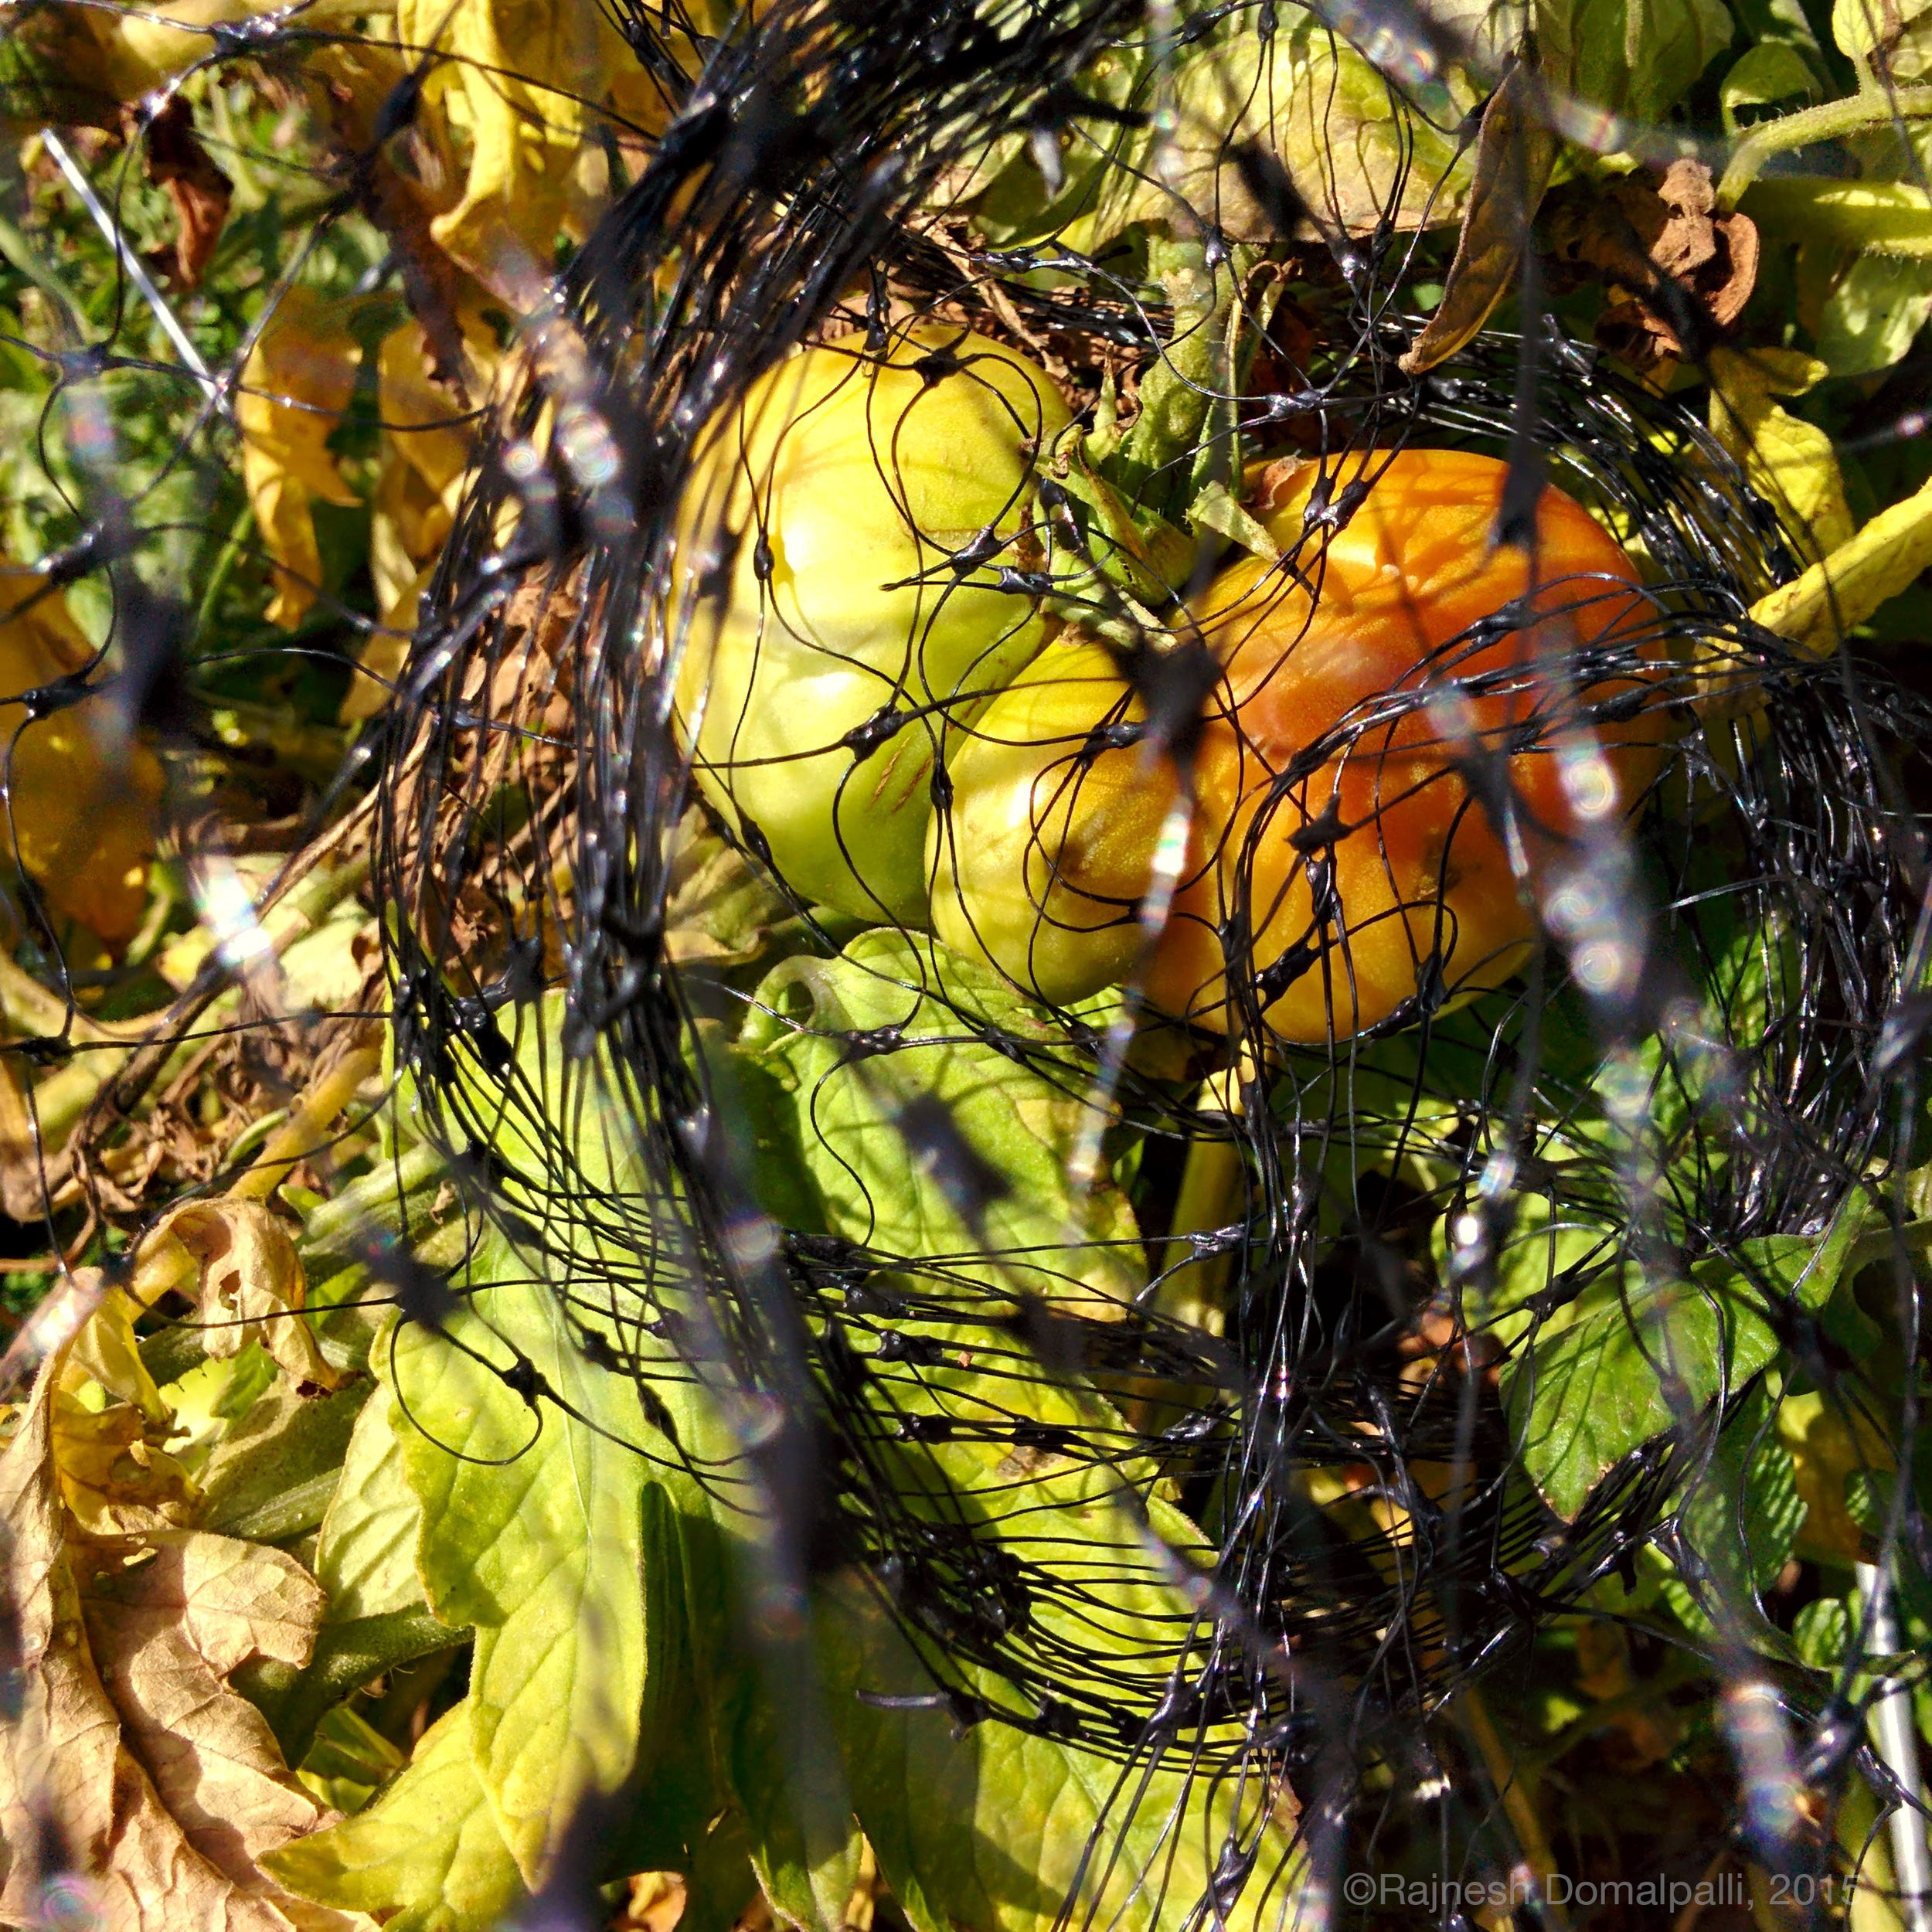 Tomatoes Under Netting